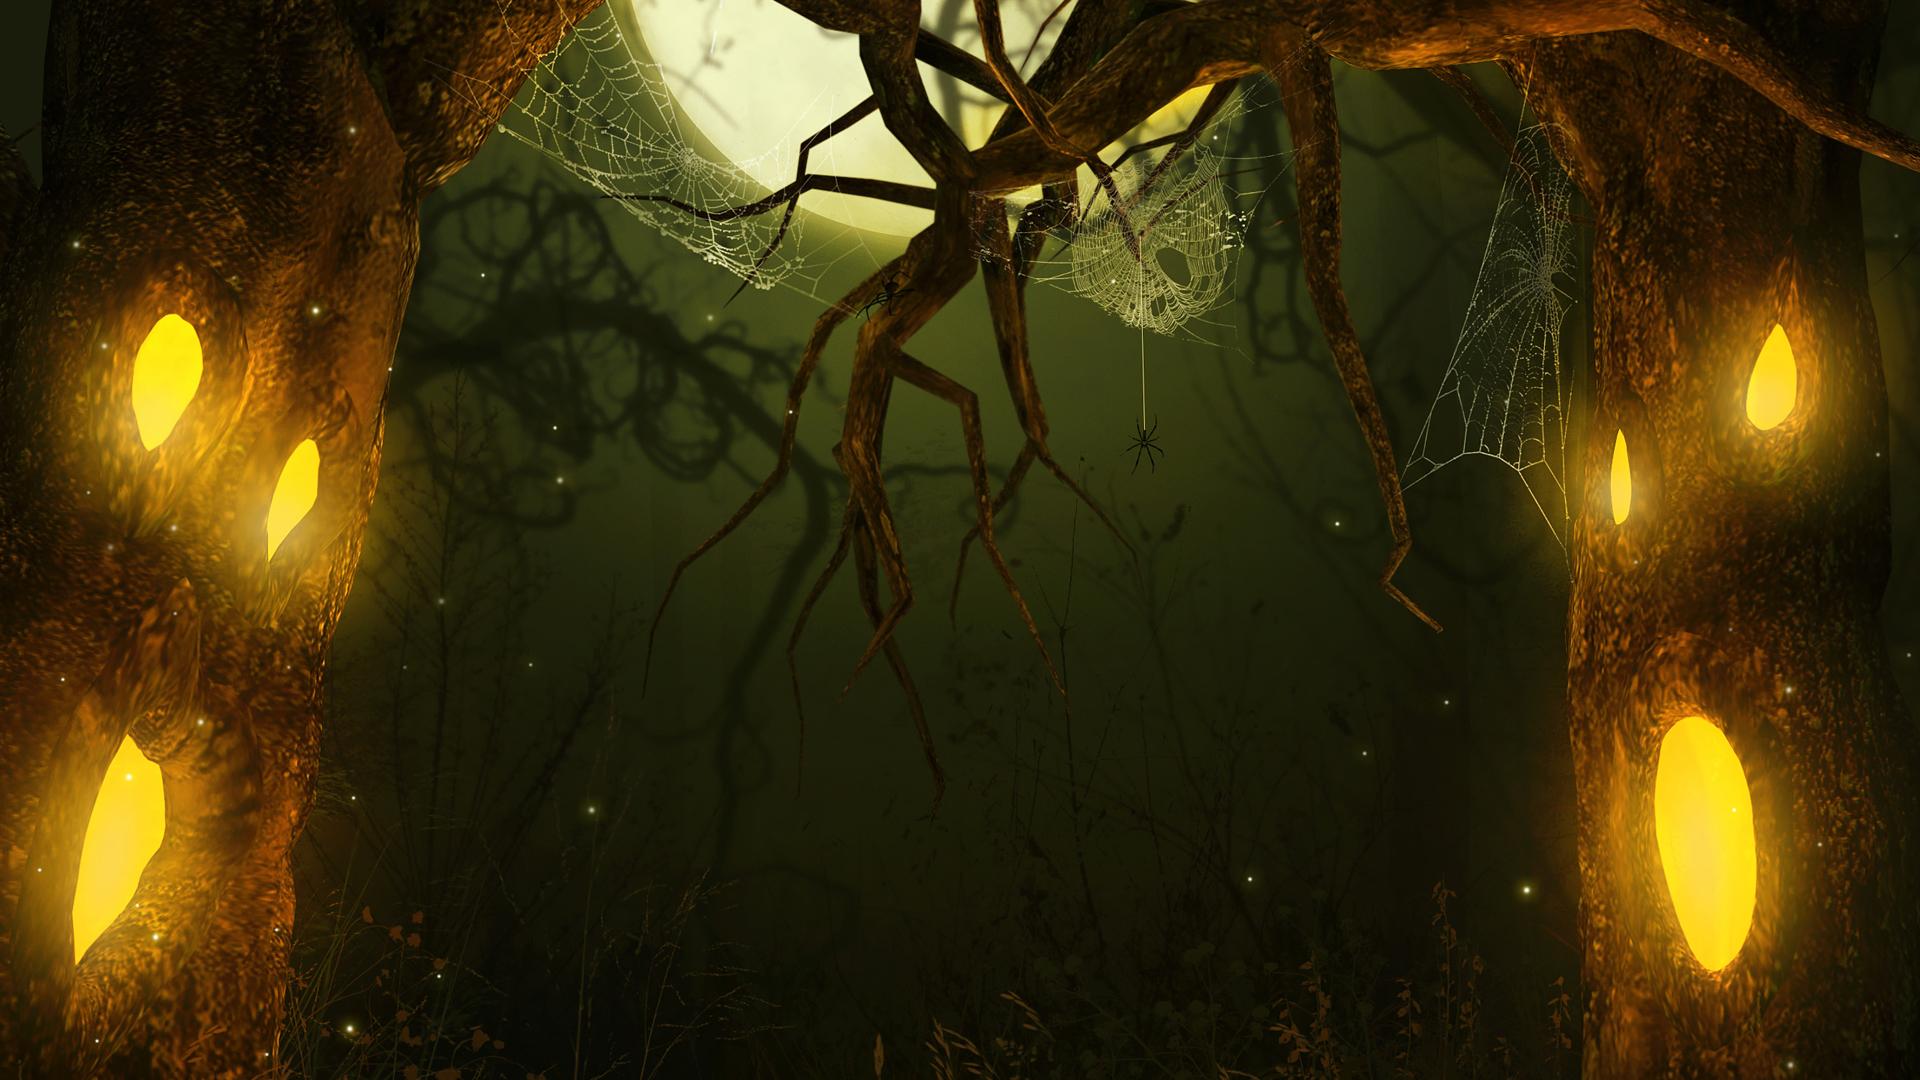 563 halloween hd wallpapers - photo #11